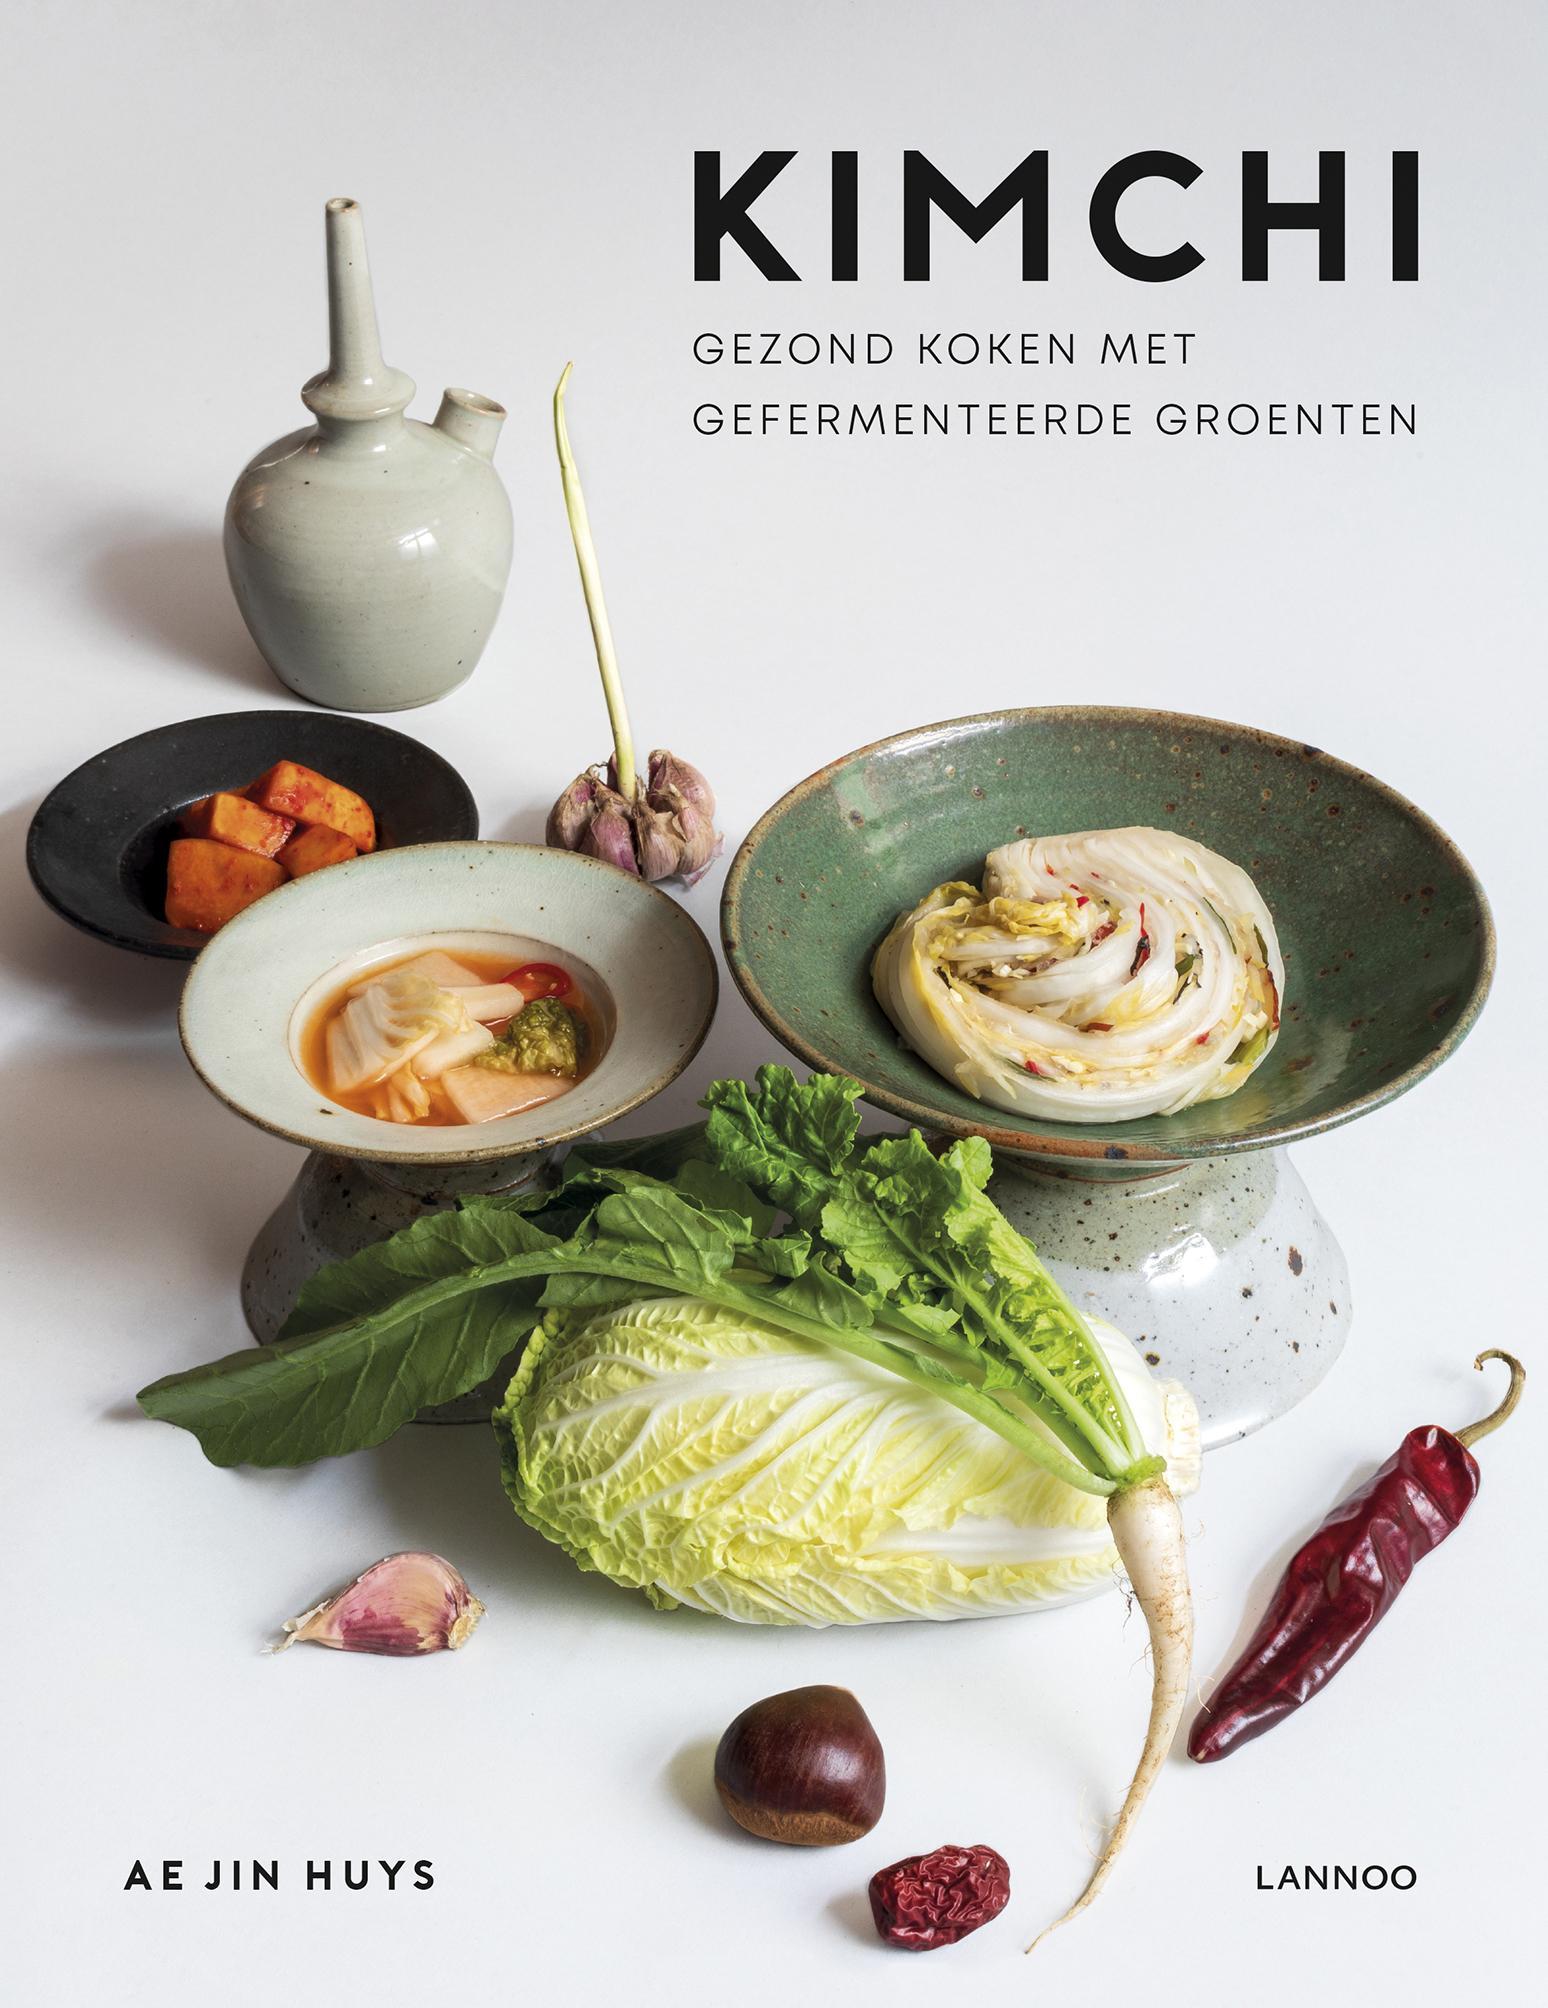 Kimchi